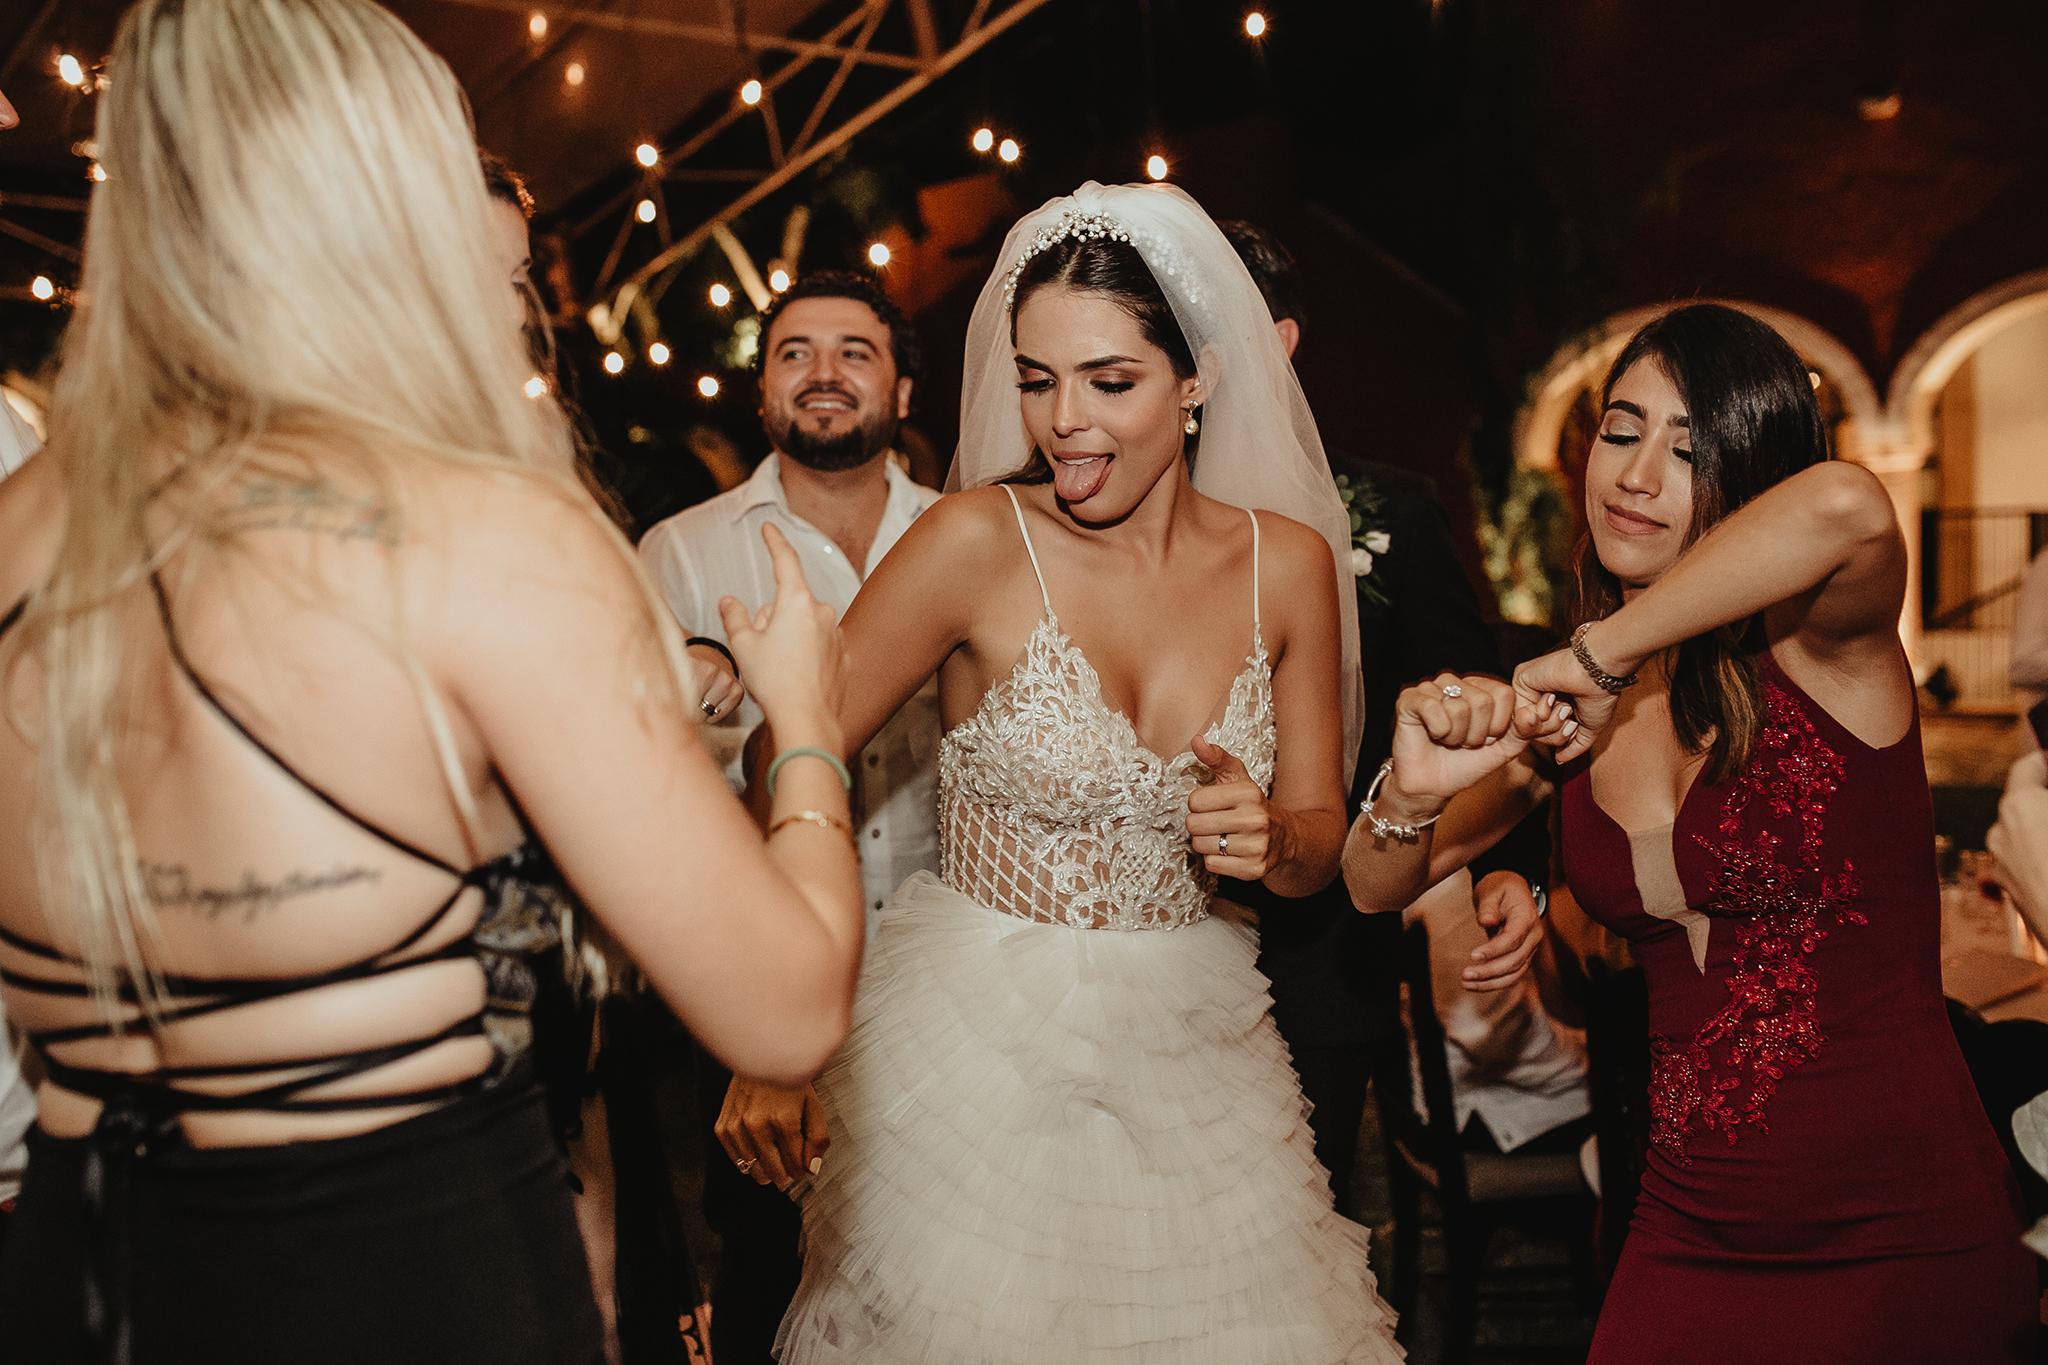 1007R&F__WeddingDestination_Weddingmerida_BodaMexico_FotografoDeBodas_FabrizioSimoneenFotografo.jpg